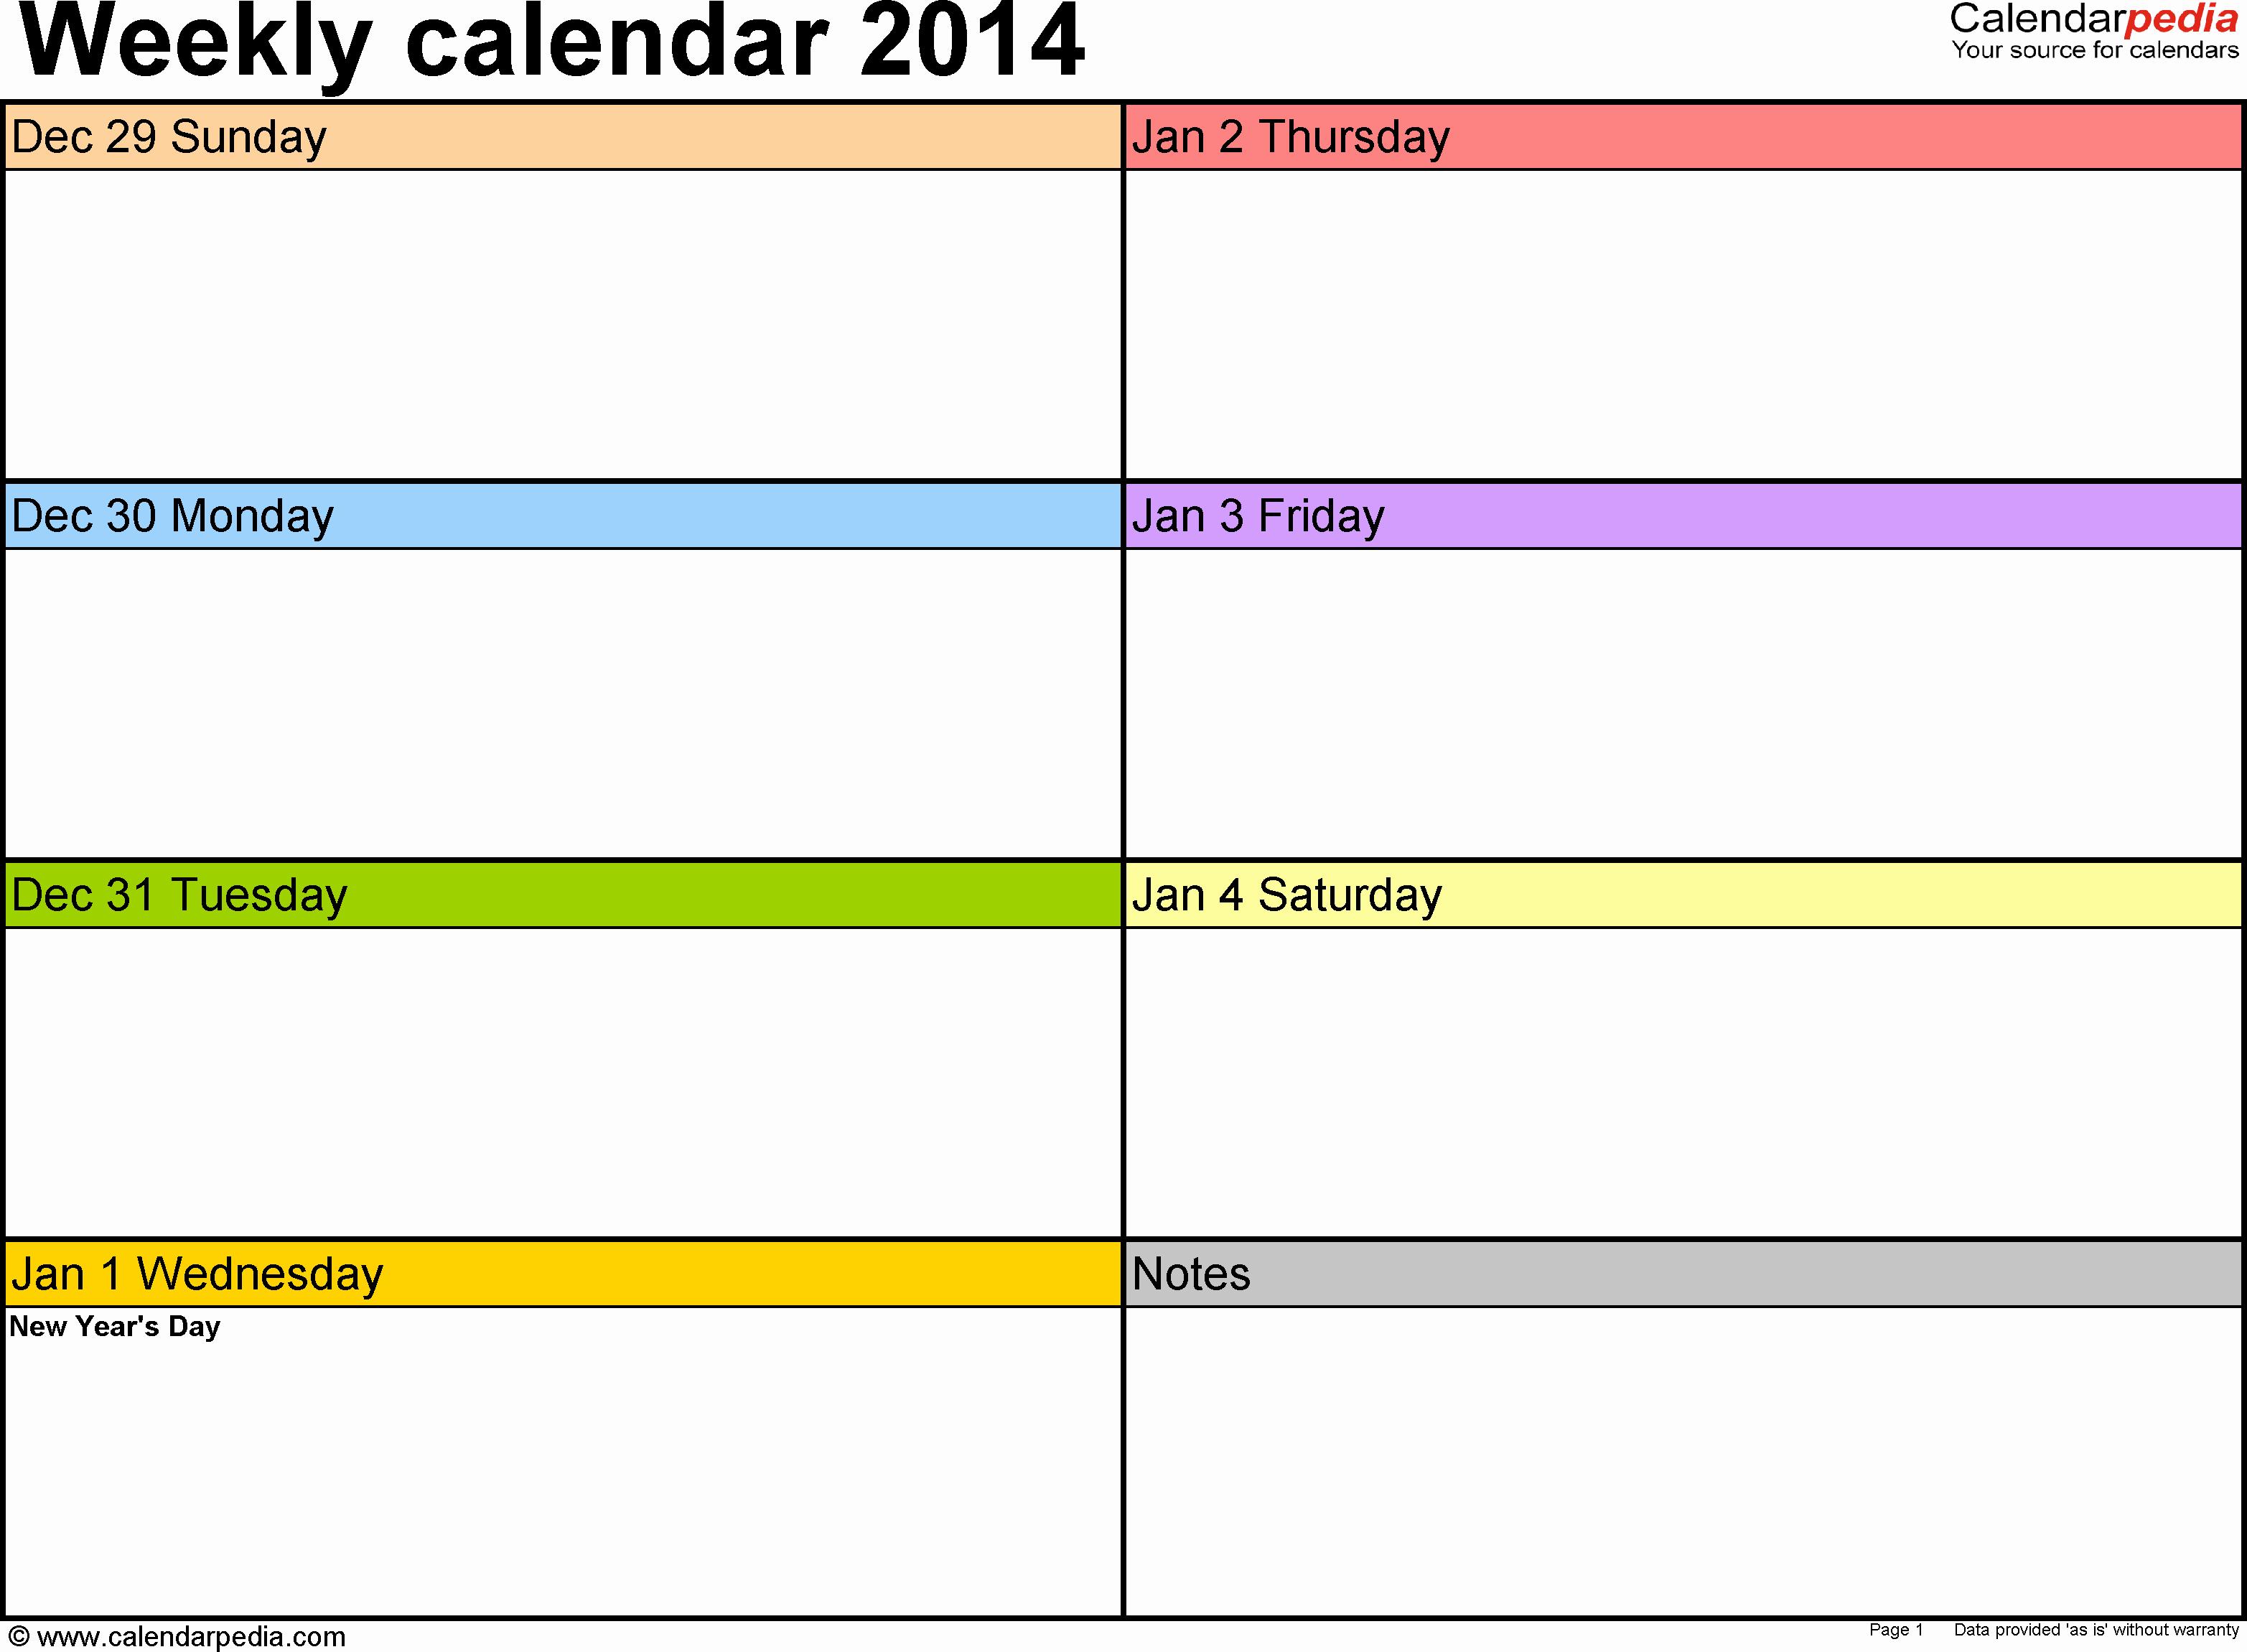 2 Week Calendar Printable Lovely Weekly Calendar 2014 for Pdf 4 Free Printable Templates